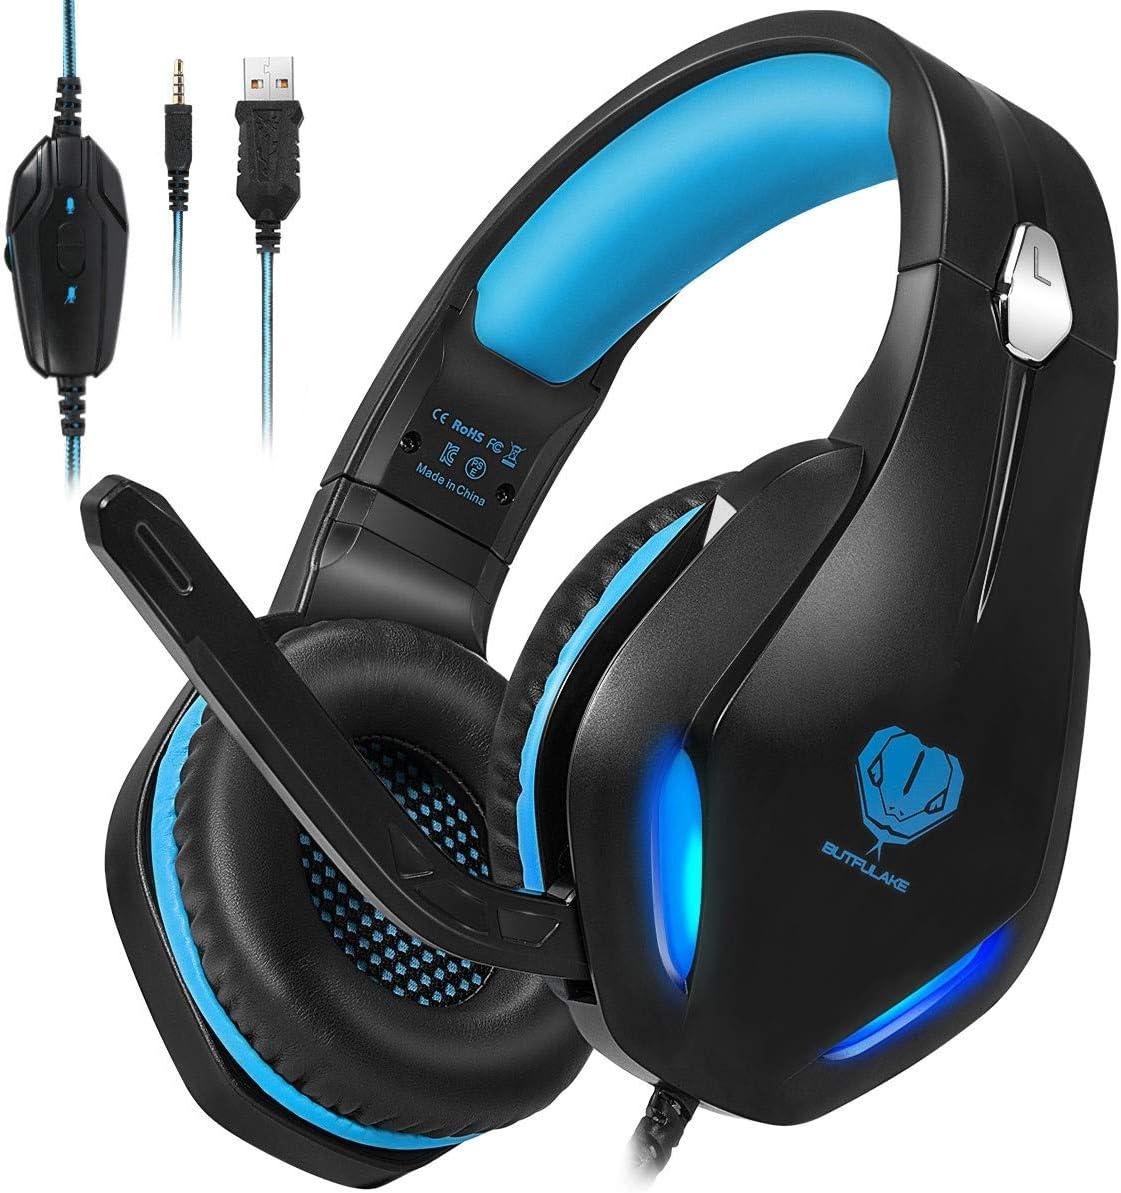 Stynice Cascos Gaming con Microfono Compatible con PS4 / PC/Xbox One/Nintendo Switch/Laptop/Mac/Mobile - Auriculares para estéreo Juegos con Cable Jack de 3.5 mm y luz LED (Azul)